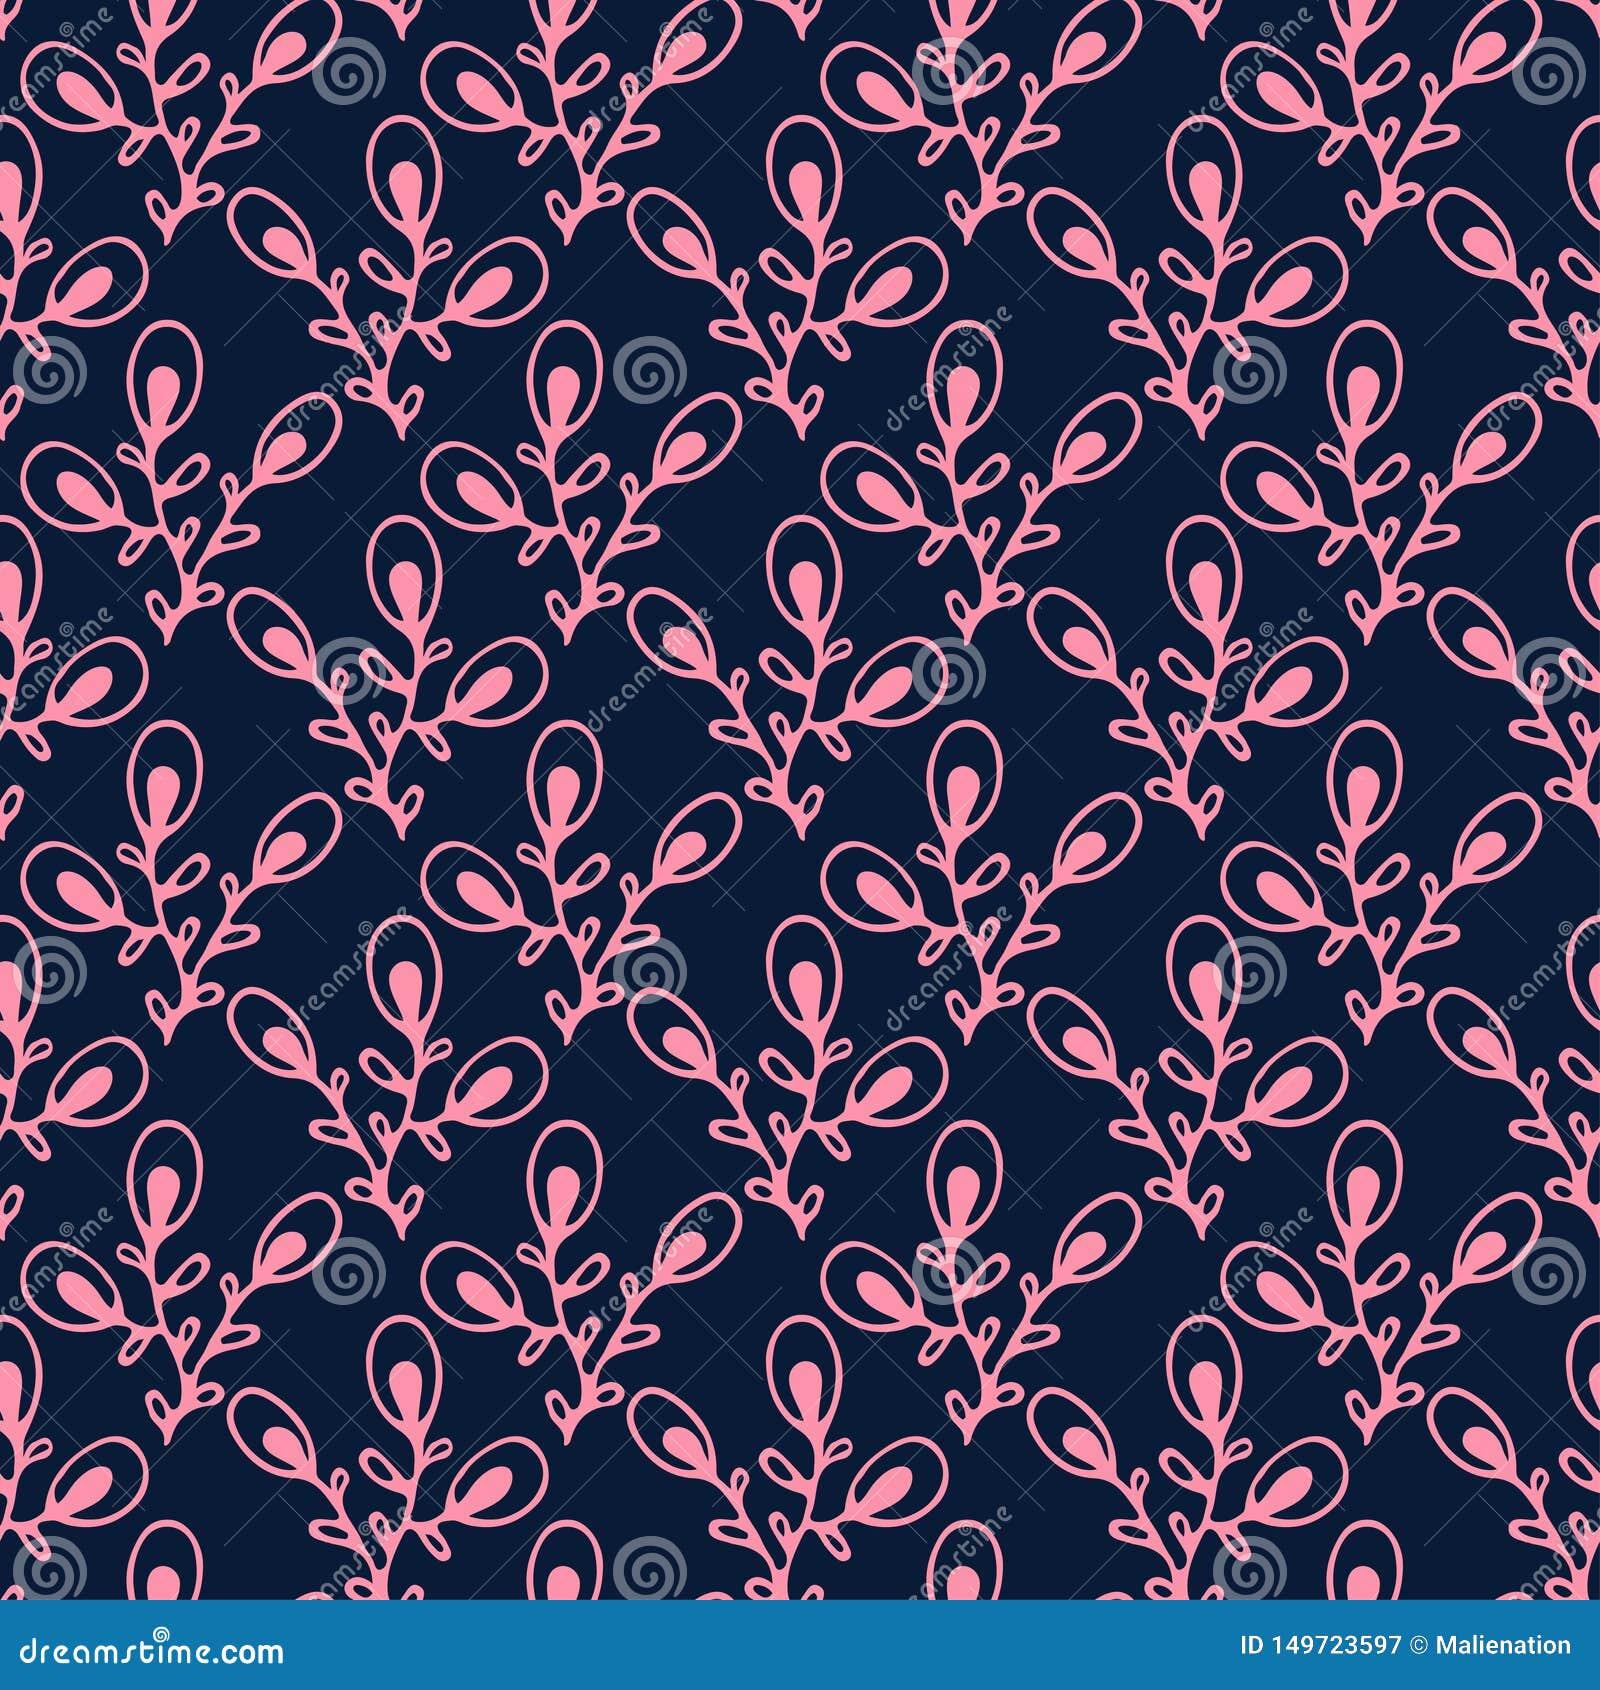 Vintage Wallpaper Background Floral Seamless Pattern